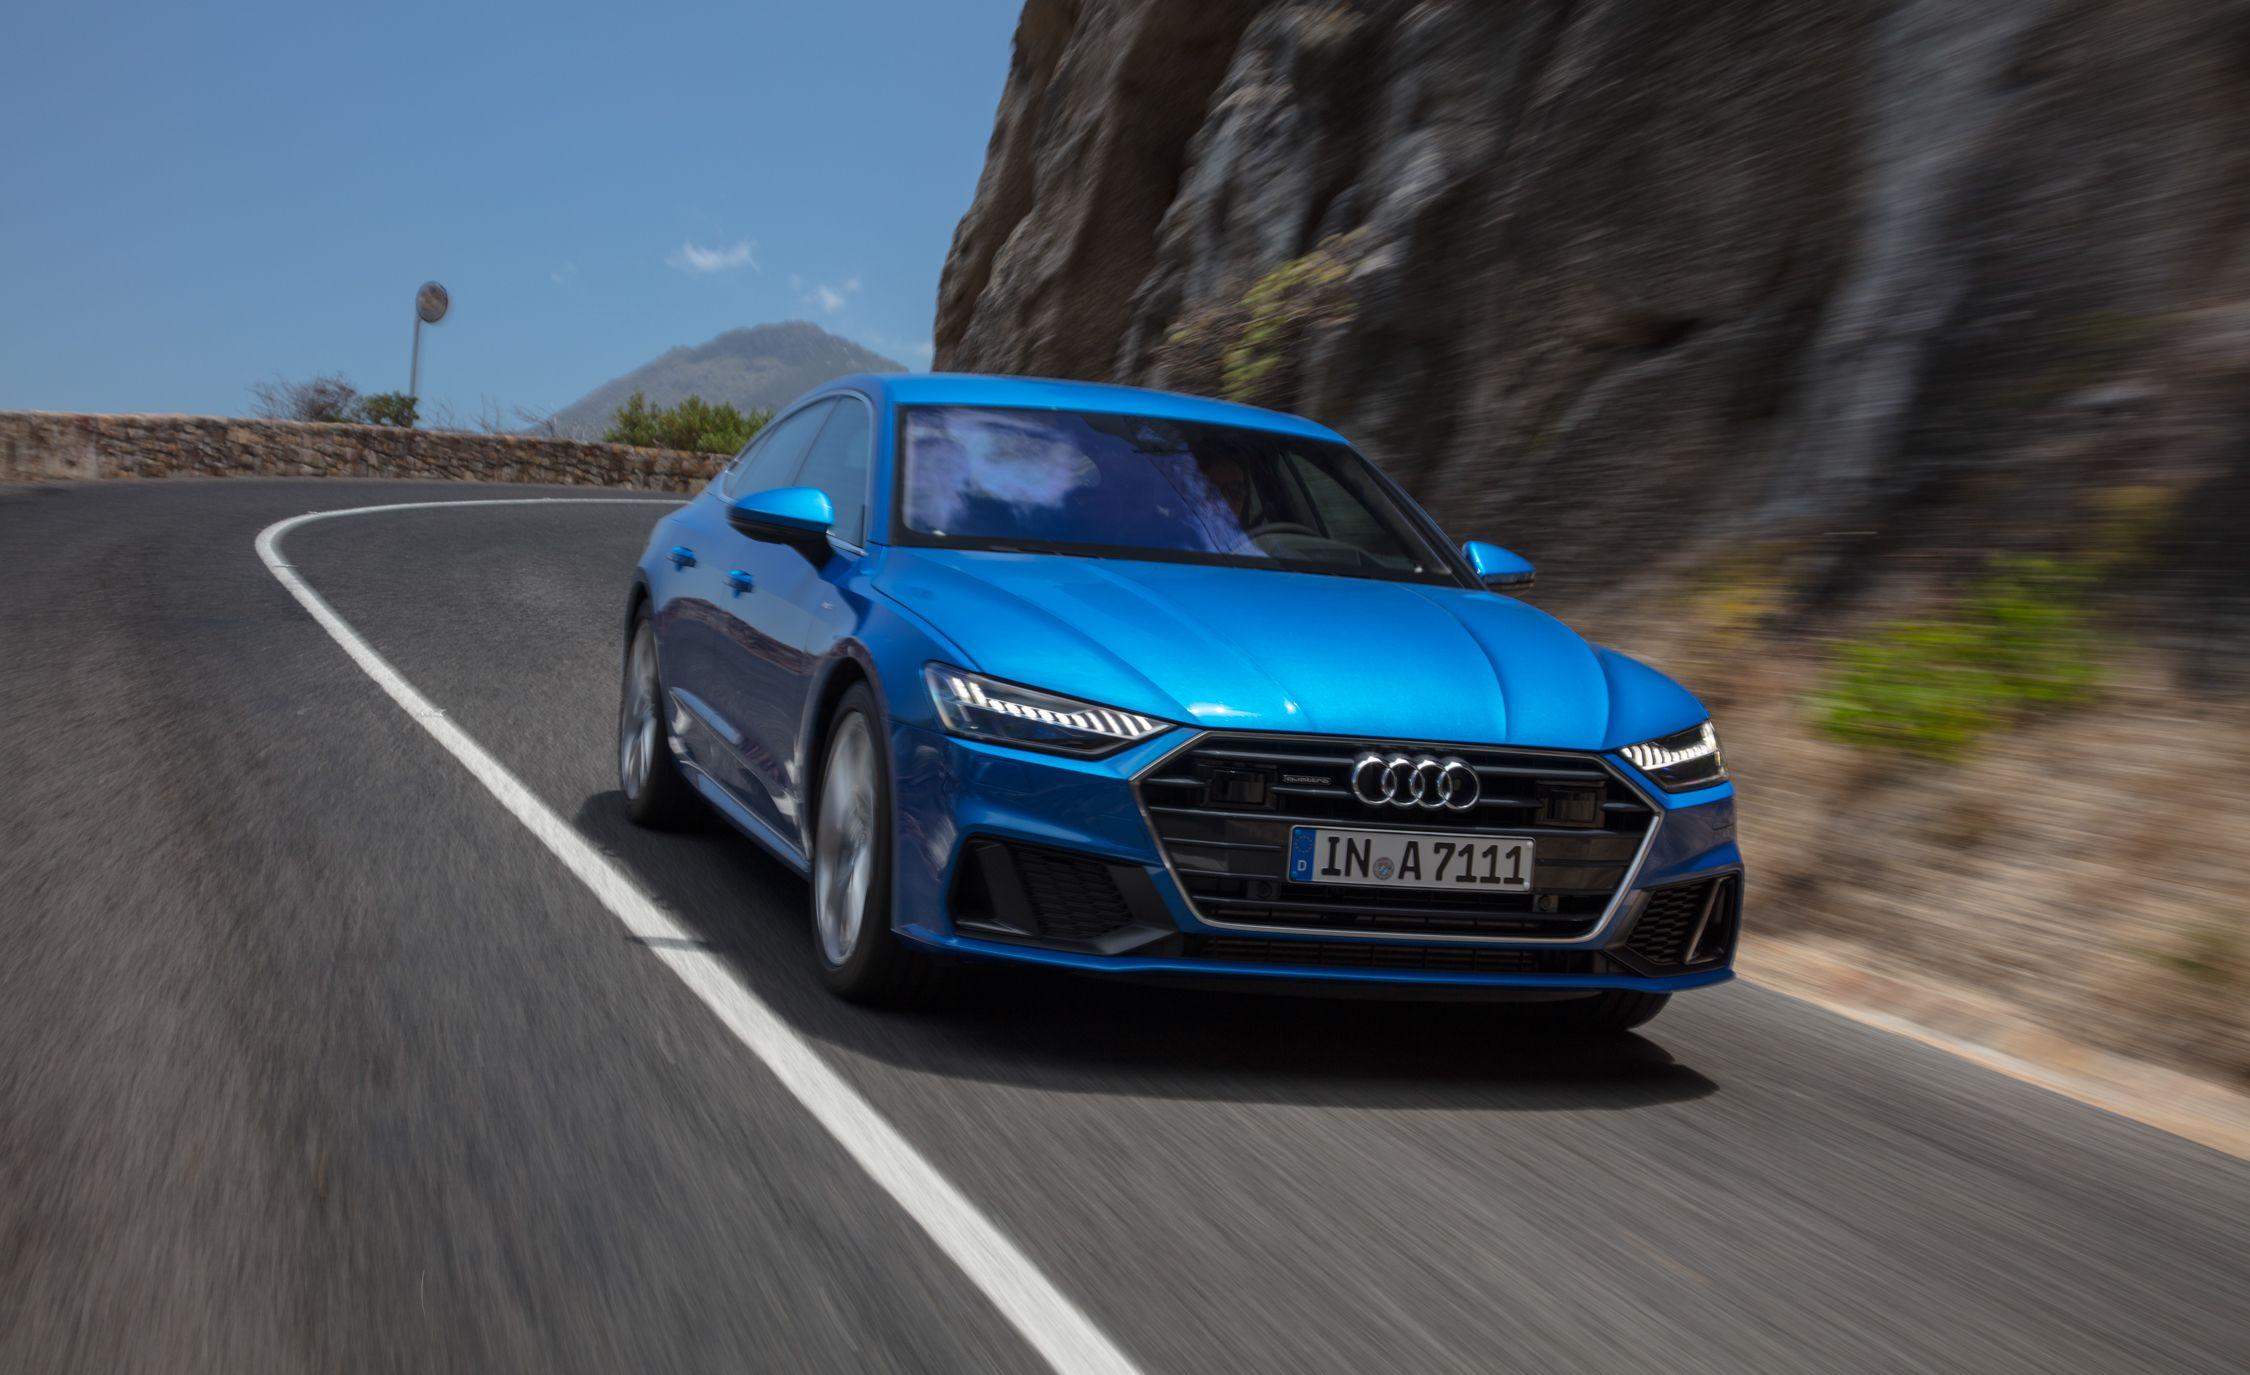 2019-Audi-A7-Sportback-110-1.jpg